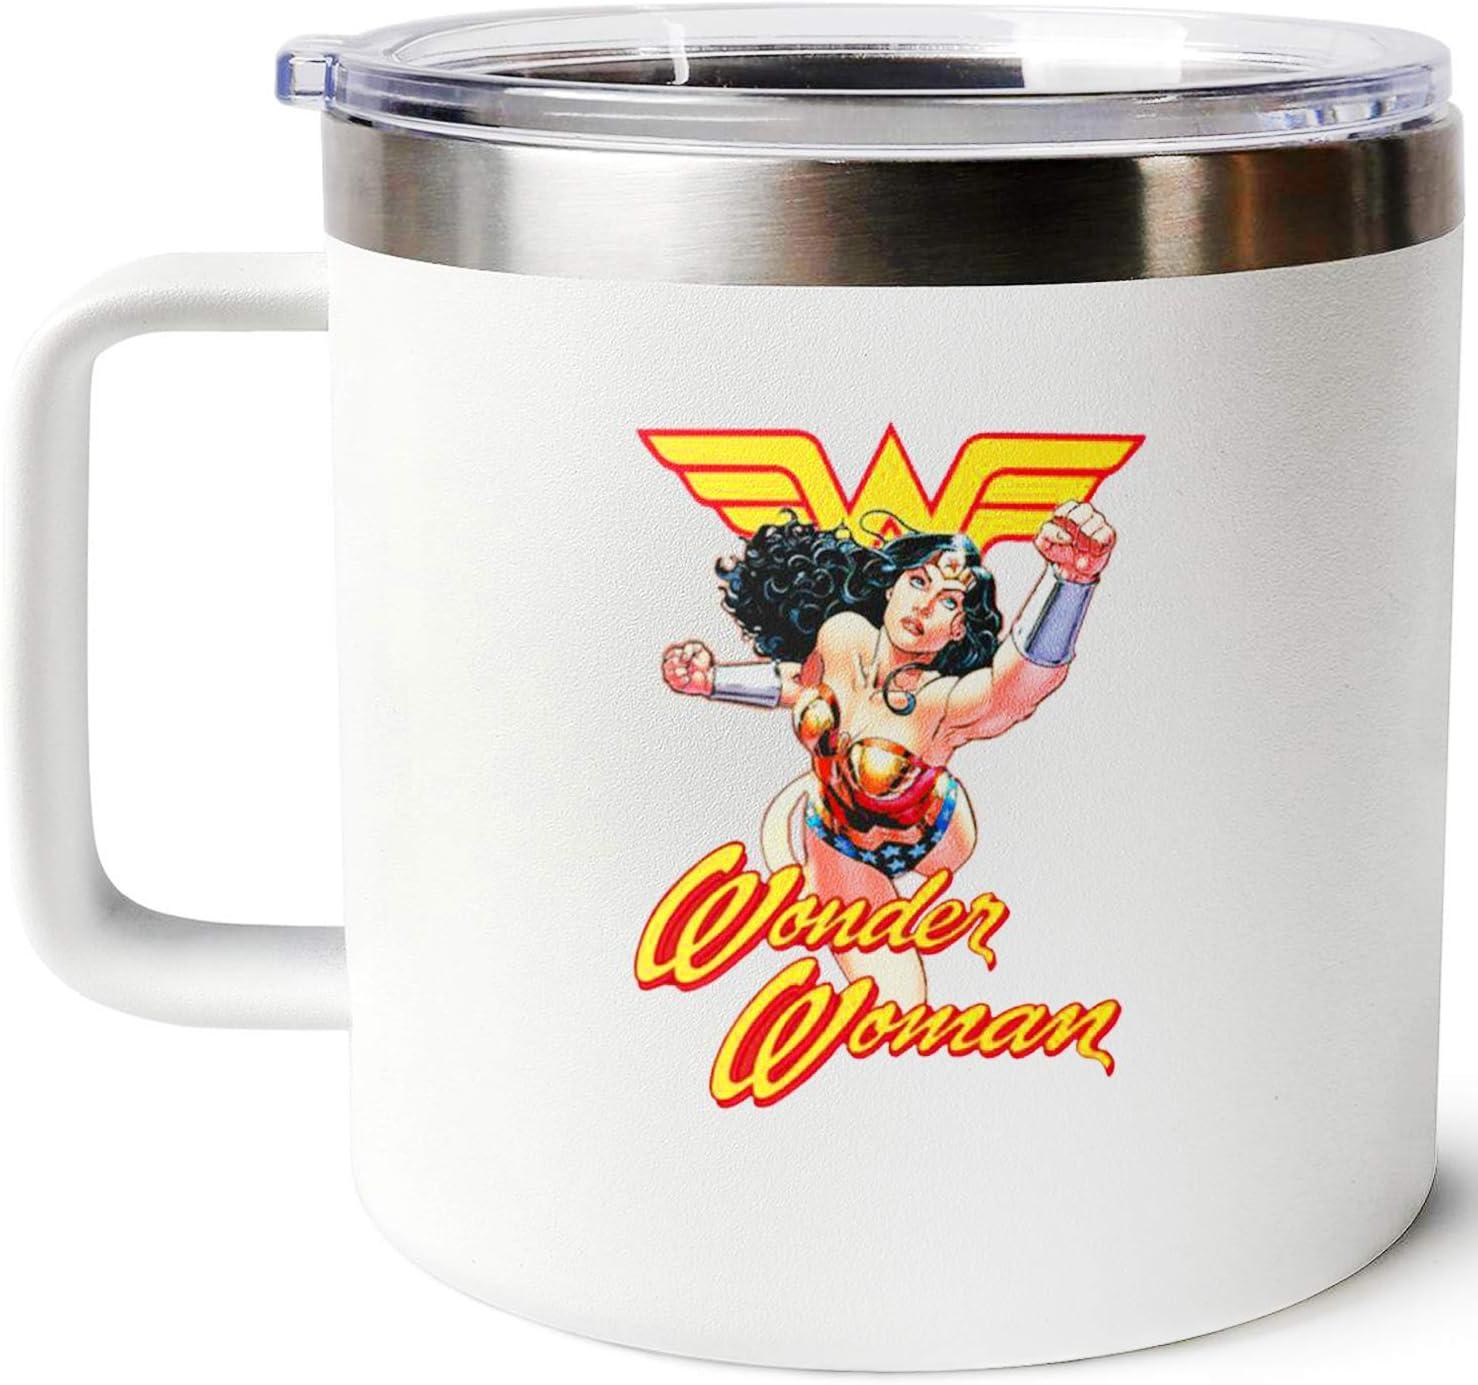 wonder women 1984 insulated coffee mug comics coffee mugs for women superhero travelstainless steel coffee 14Oz big cup cute with handle and lid travel mug wonder woman mom birthday gifts